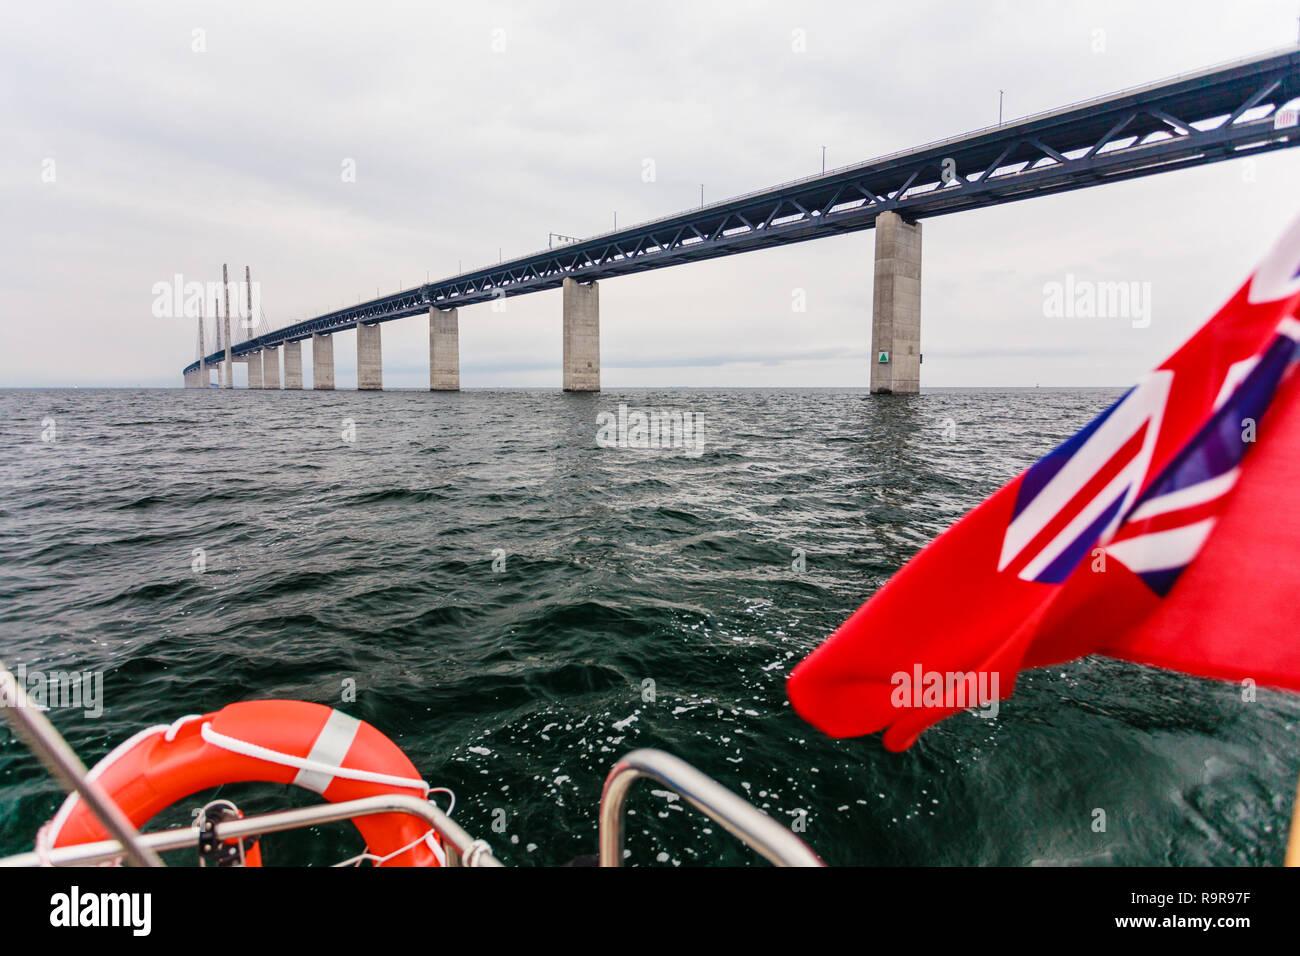 Oresundsbron. The Oresund bridge link between Denmark and Sweden, Europe, Baltic Sea. View from sailboat yacht under uk british ensign. Traveling. Stock Photo